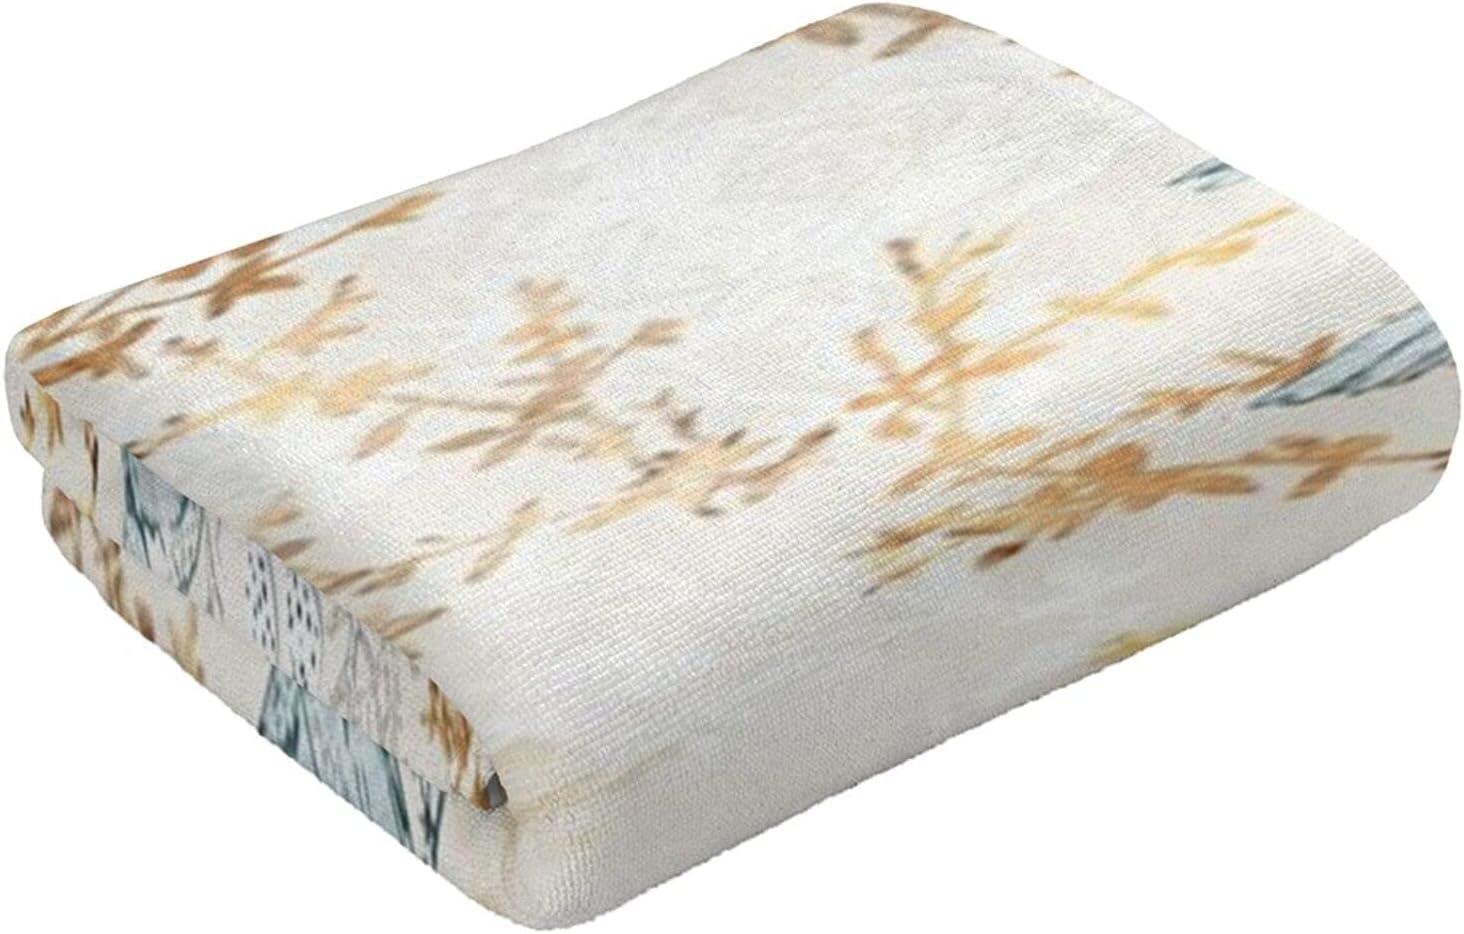 Sale favorite Towels Hand Washcloths 27.5x12 Polyester Fingert Inch